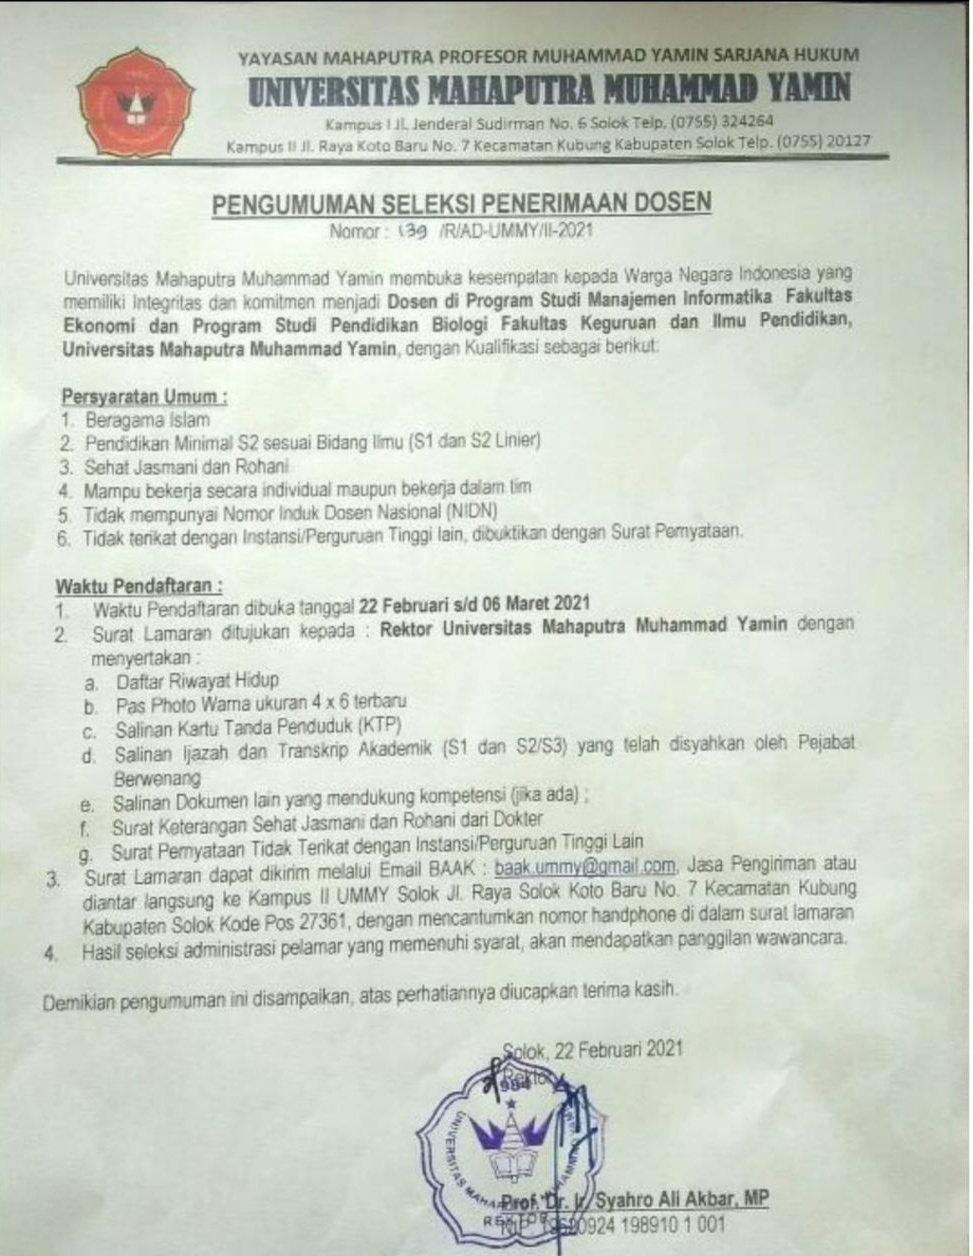 Seleksi Penerimaan Dosen Pendidikan Biologi Universitas Muhammad Yamin Pascasarjana Fkip